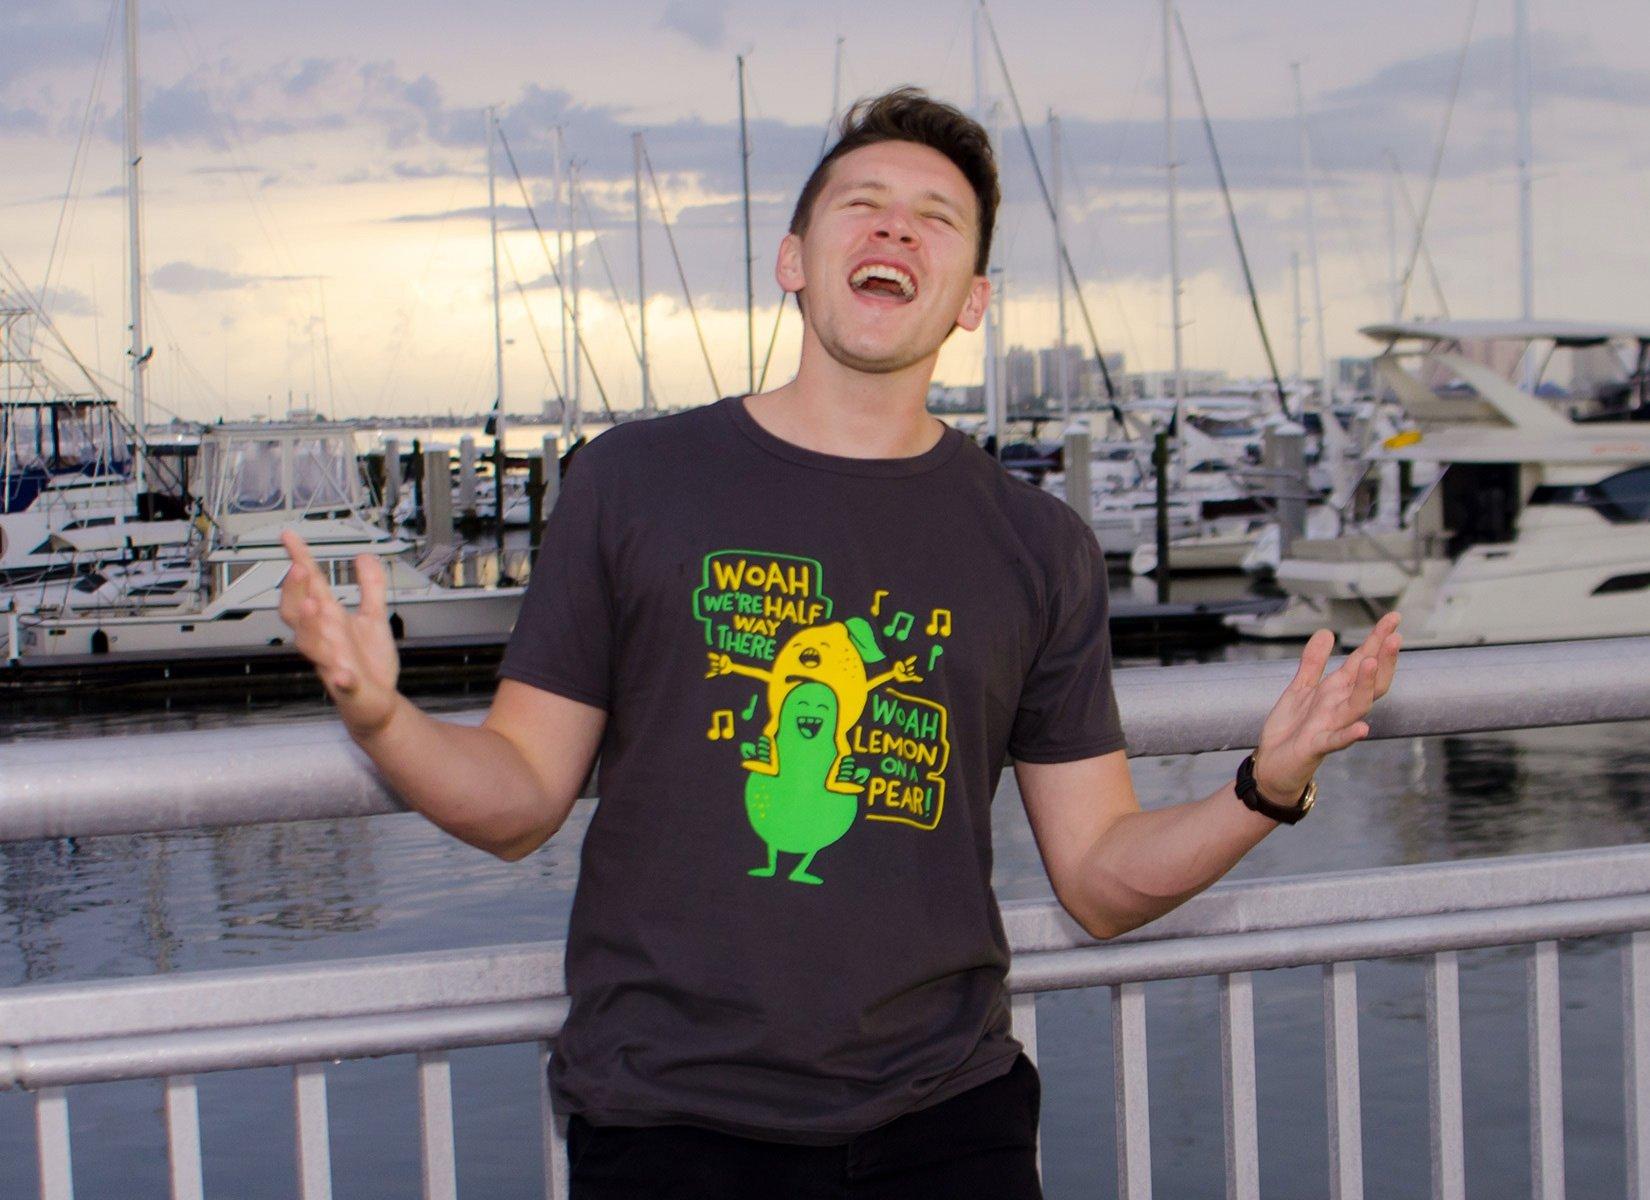 Lemon On A Pear on Mens T-Shirt